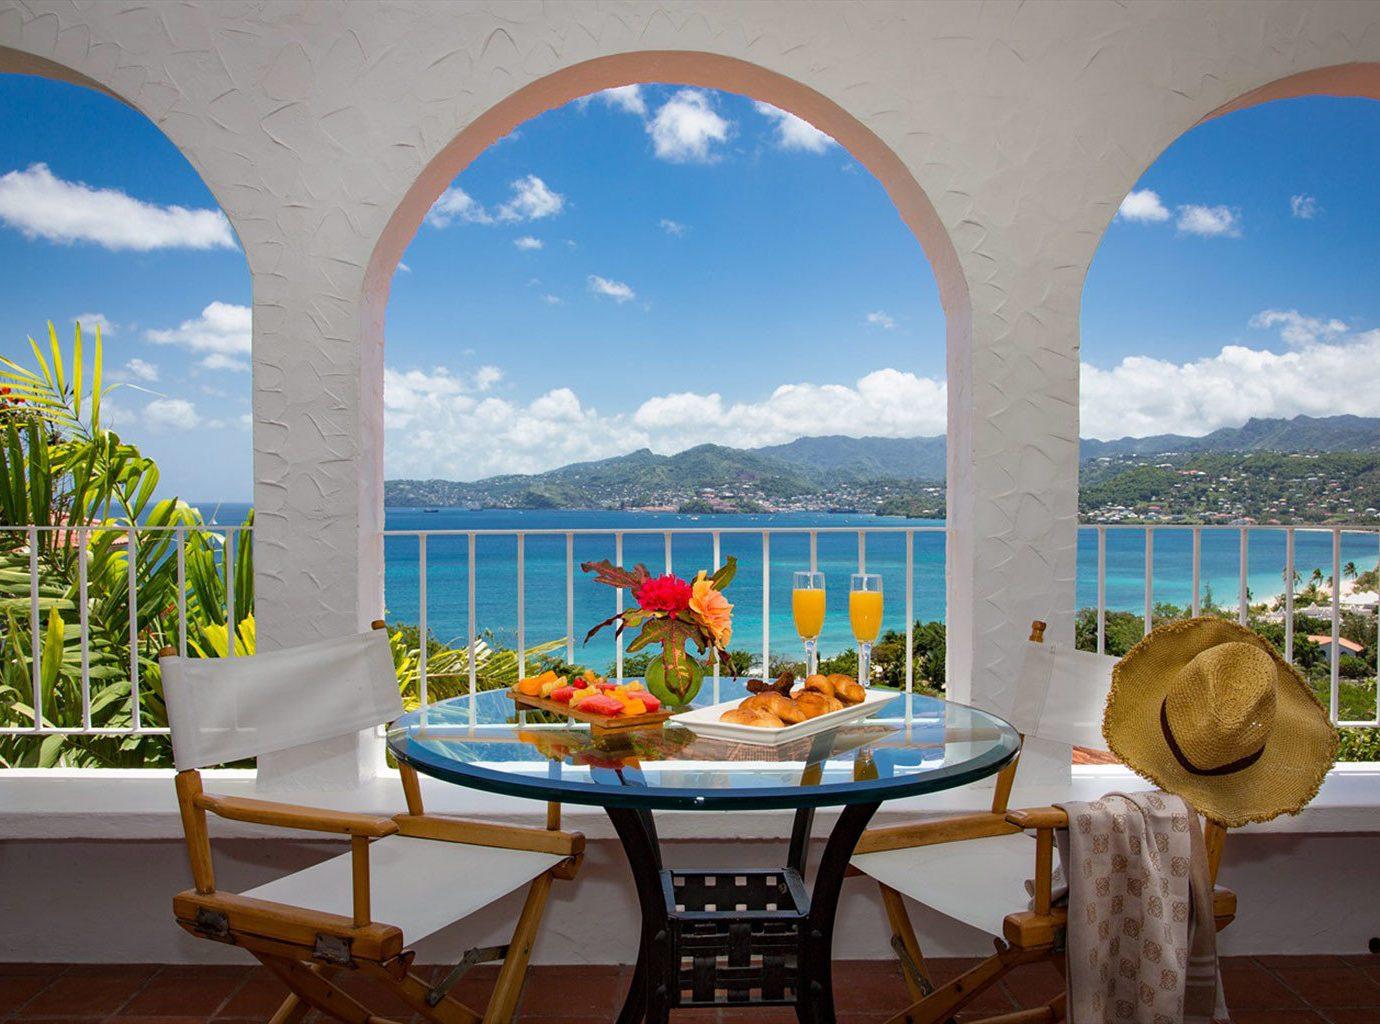 leisure property swimming pool Resort home Villa caribbean hacienda arch colonnade